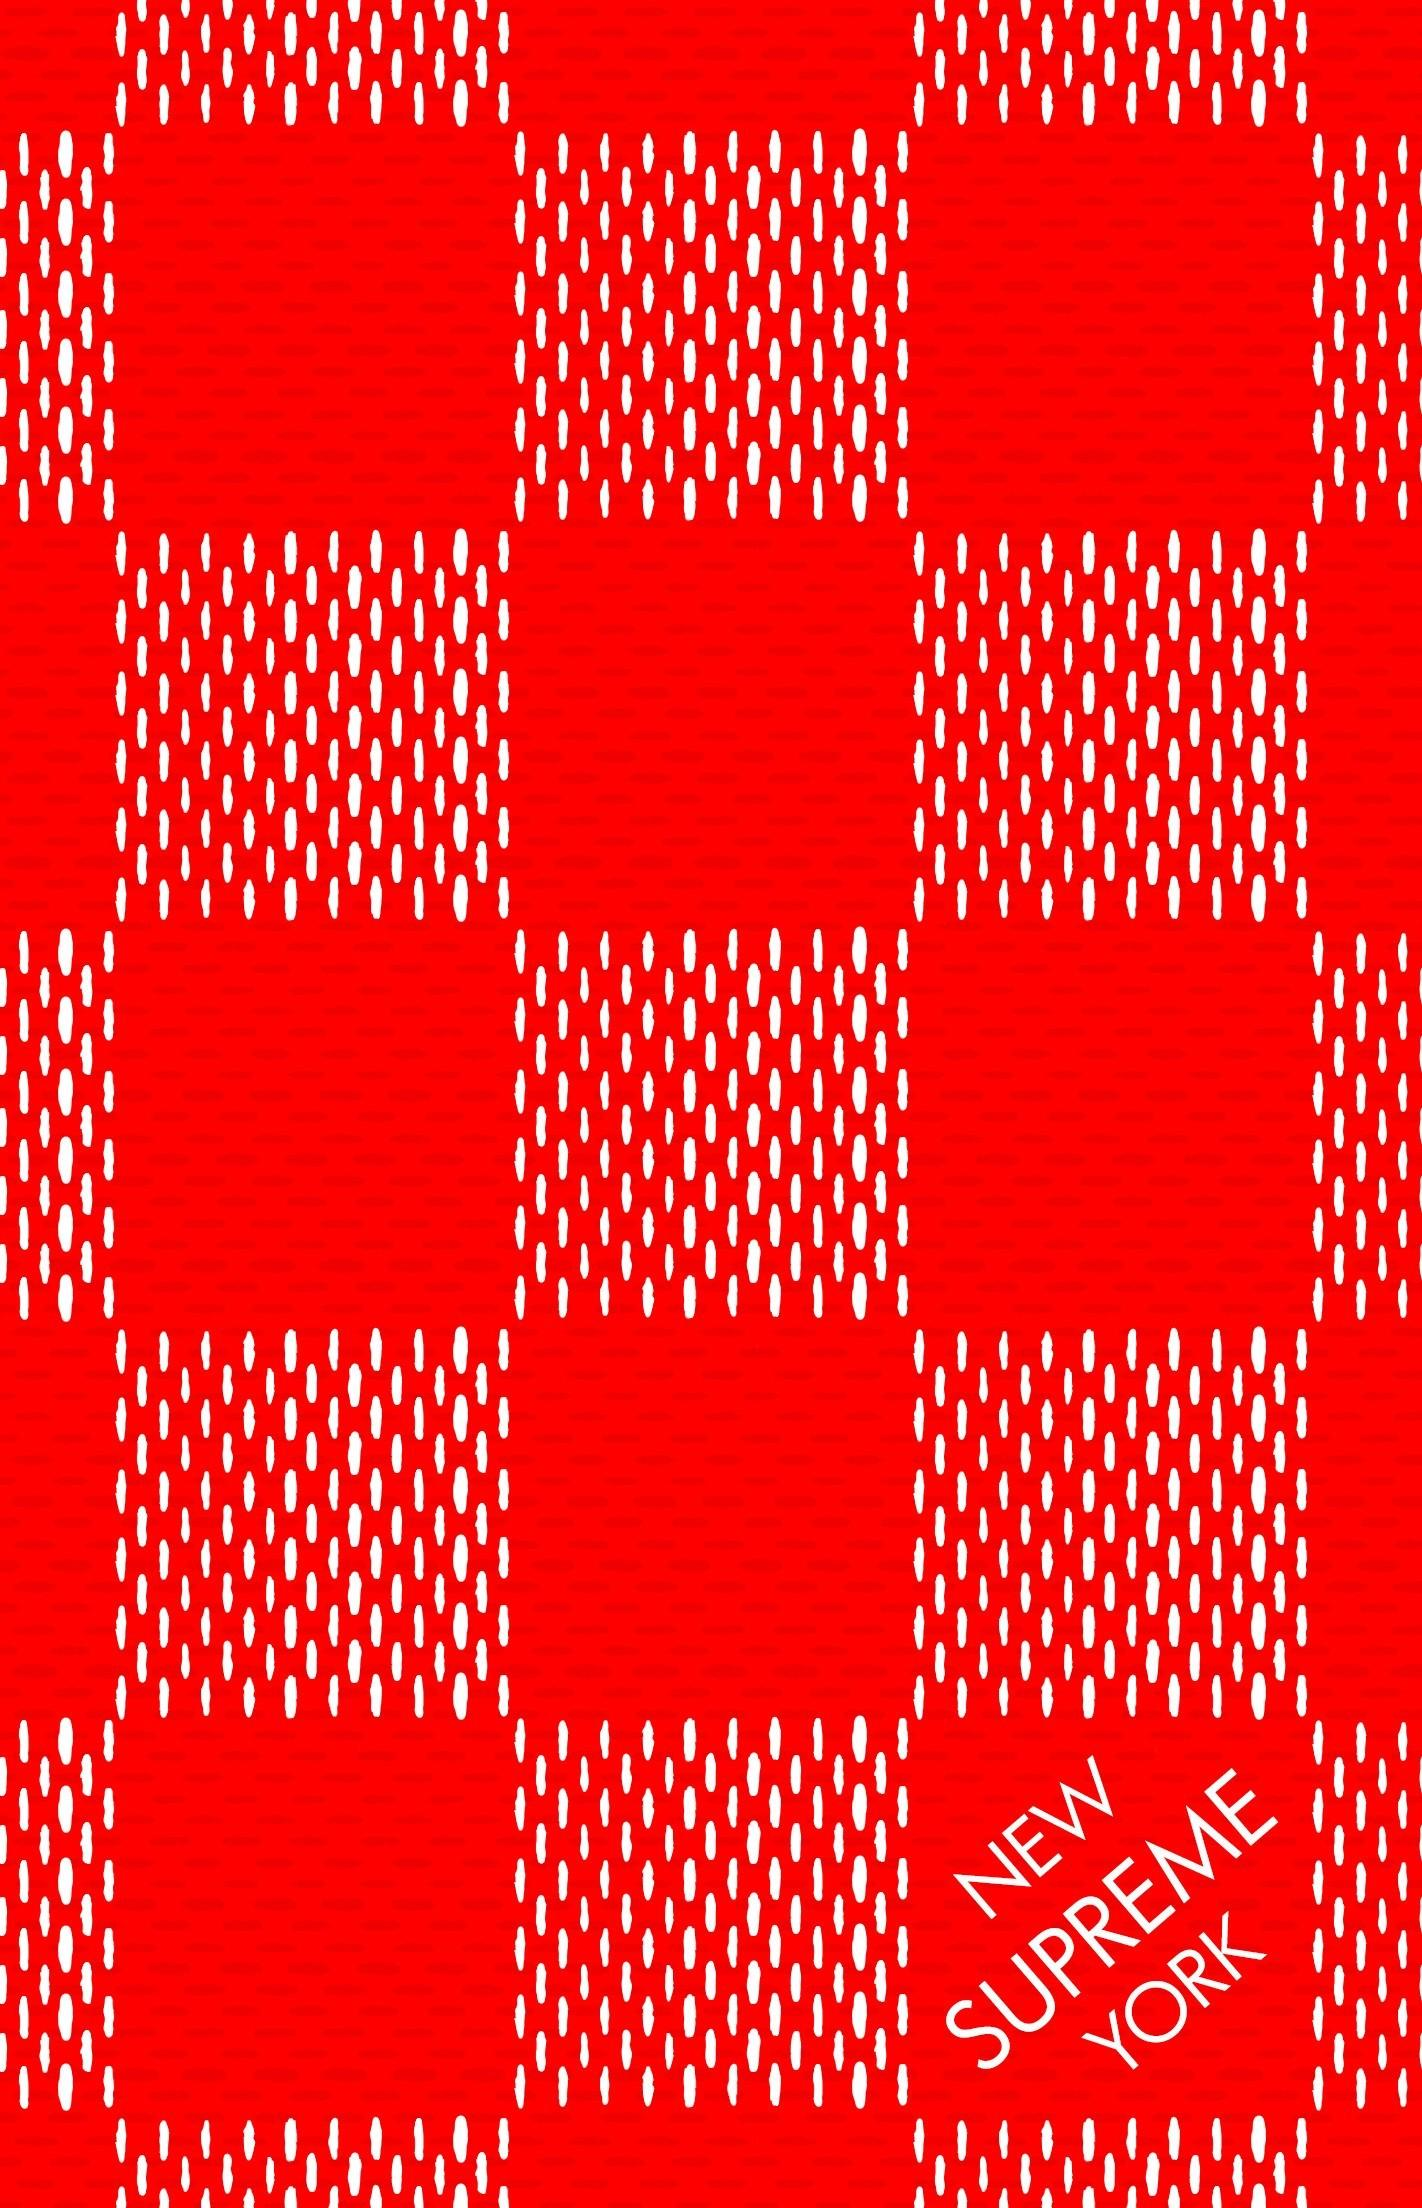 Louis Vuitton Wallpaper Red : louis, vuitton, wallpaper, Supreme, Louis, Vuitton, Wallpaper, 1422x2208, Teahub.io